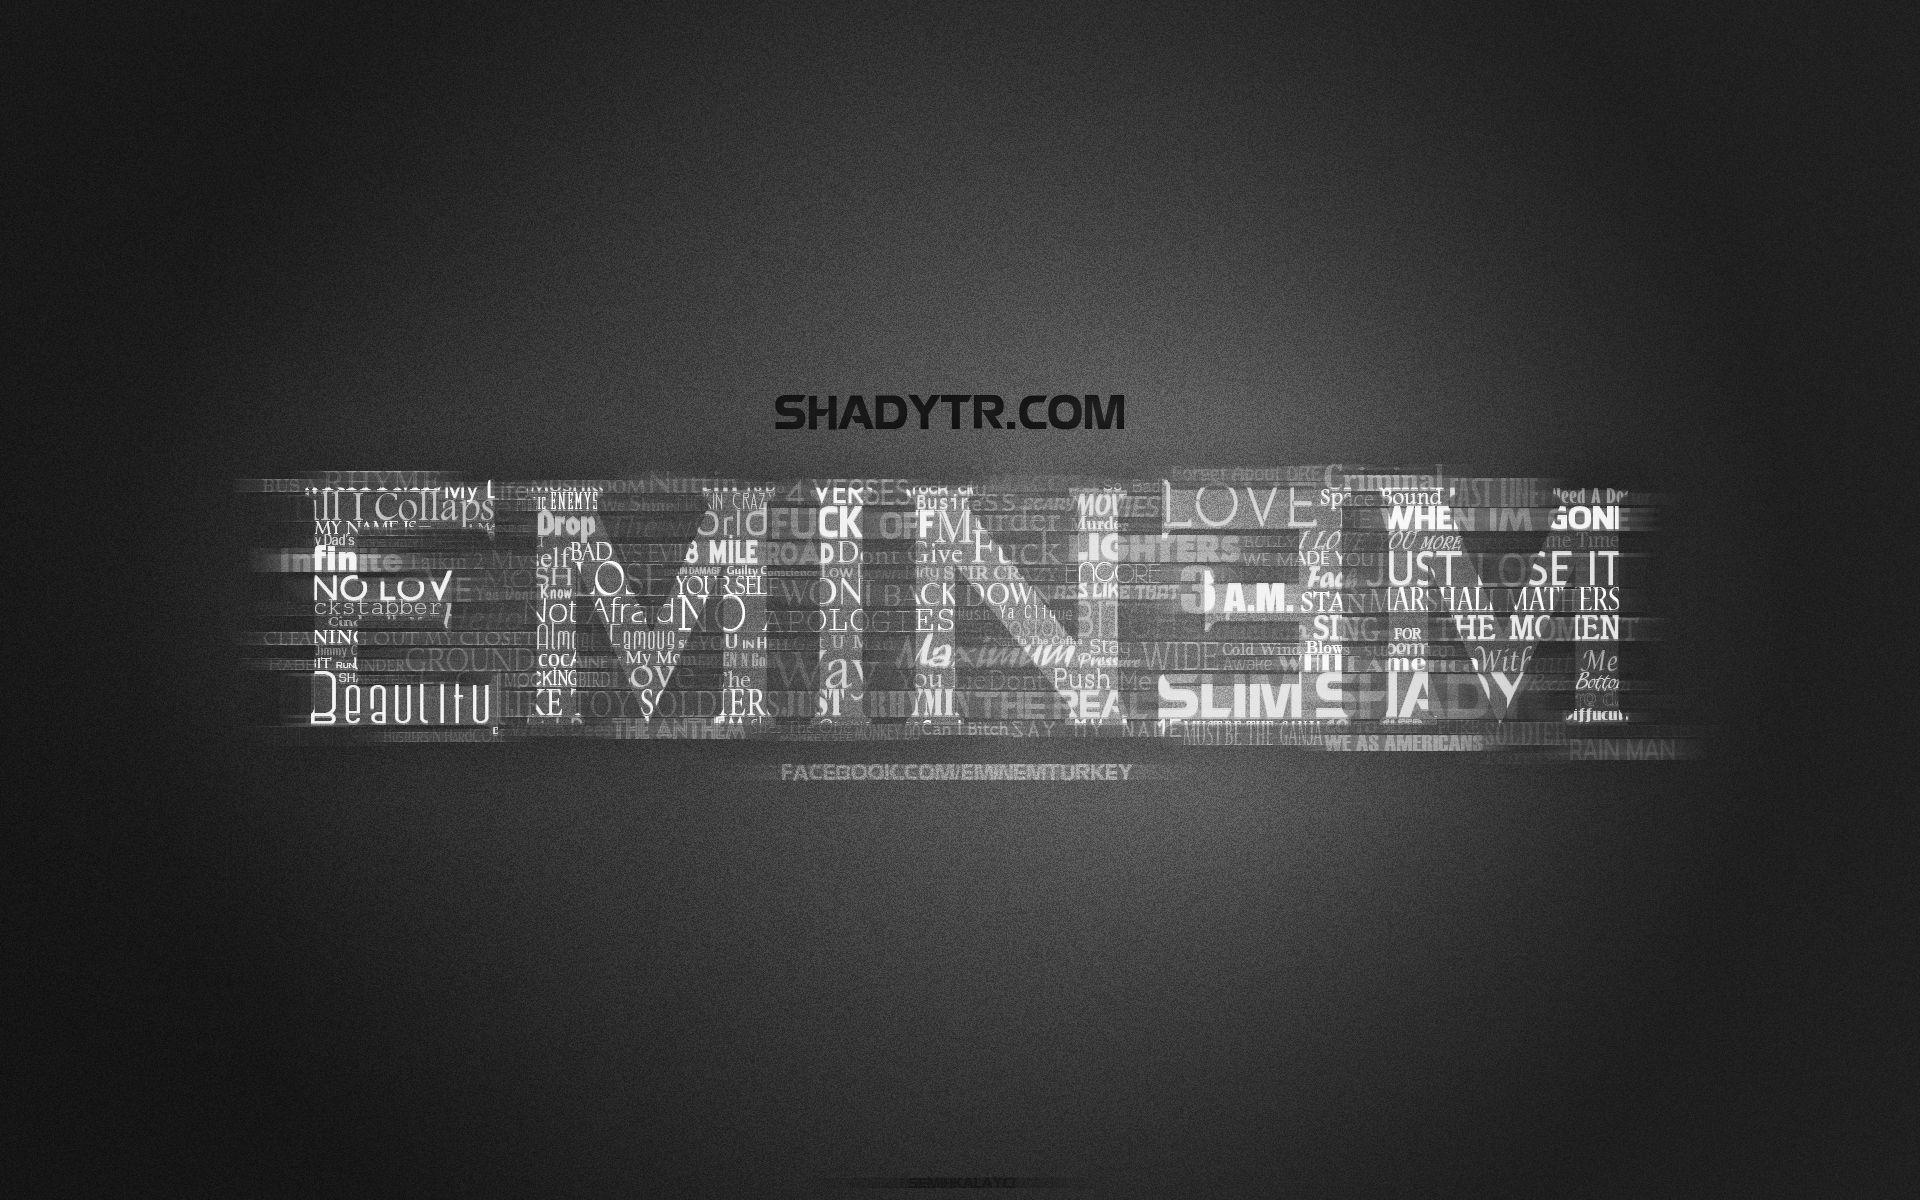 Mobile Wallpaper Quotes Imgur Eminem Logo Wallpapers Top Free Eminem Logo Backgrounds